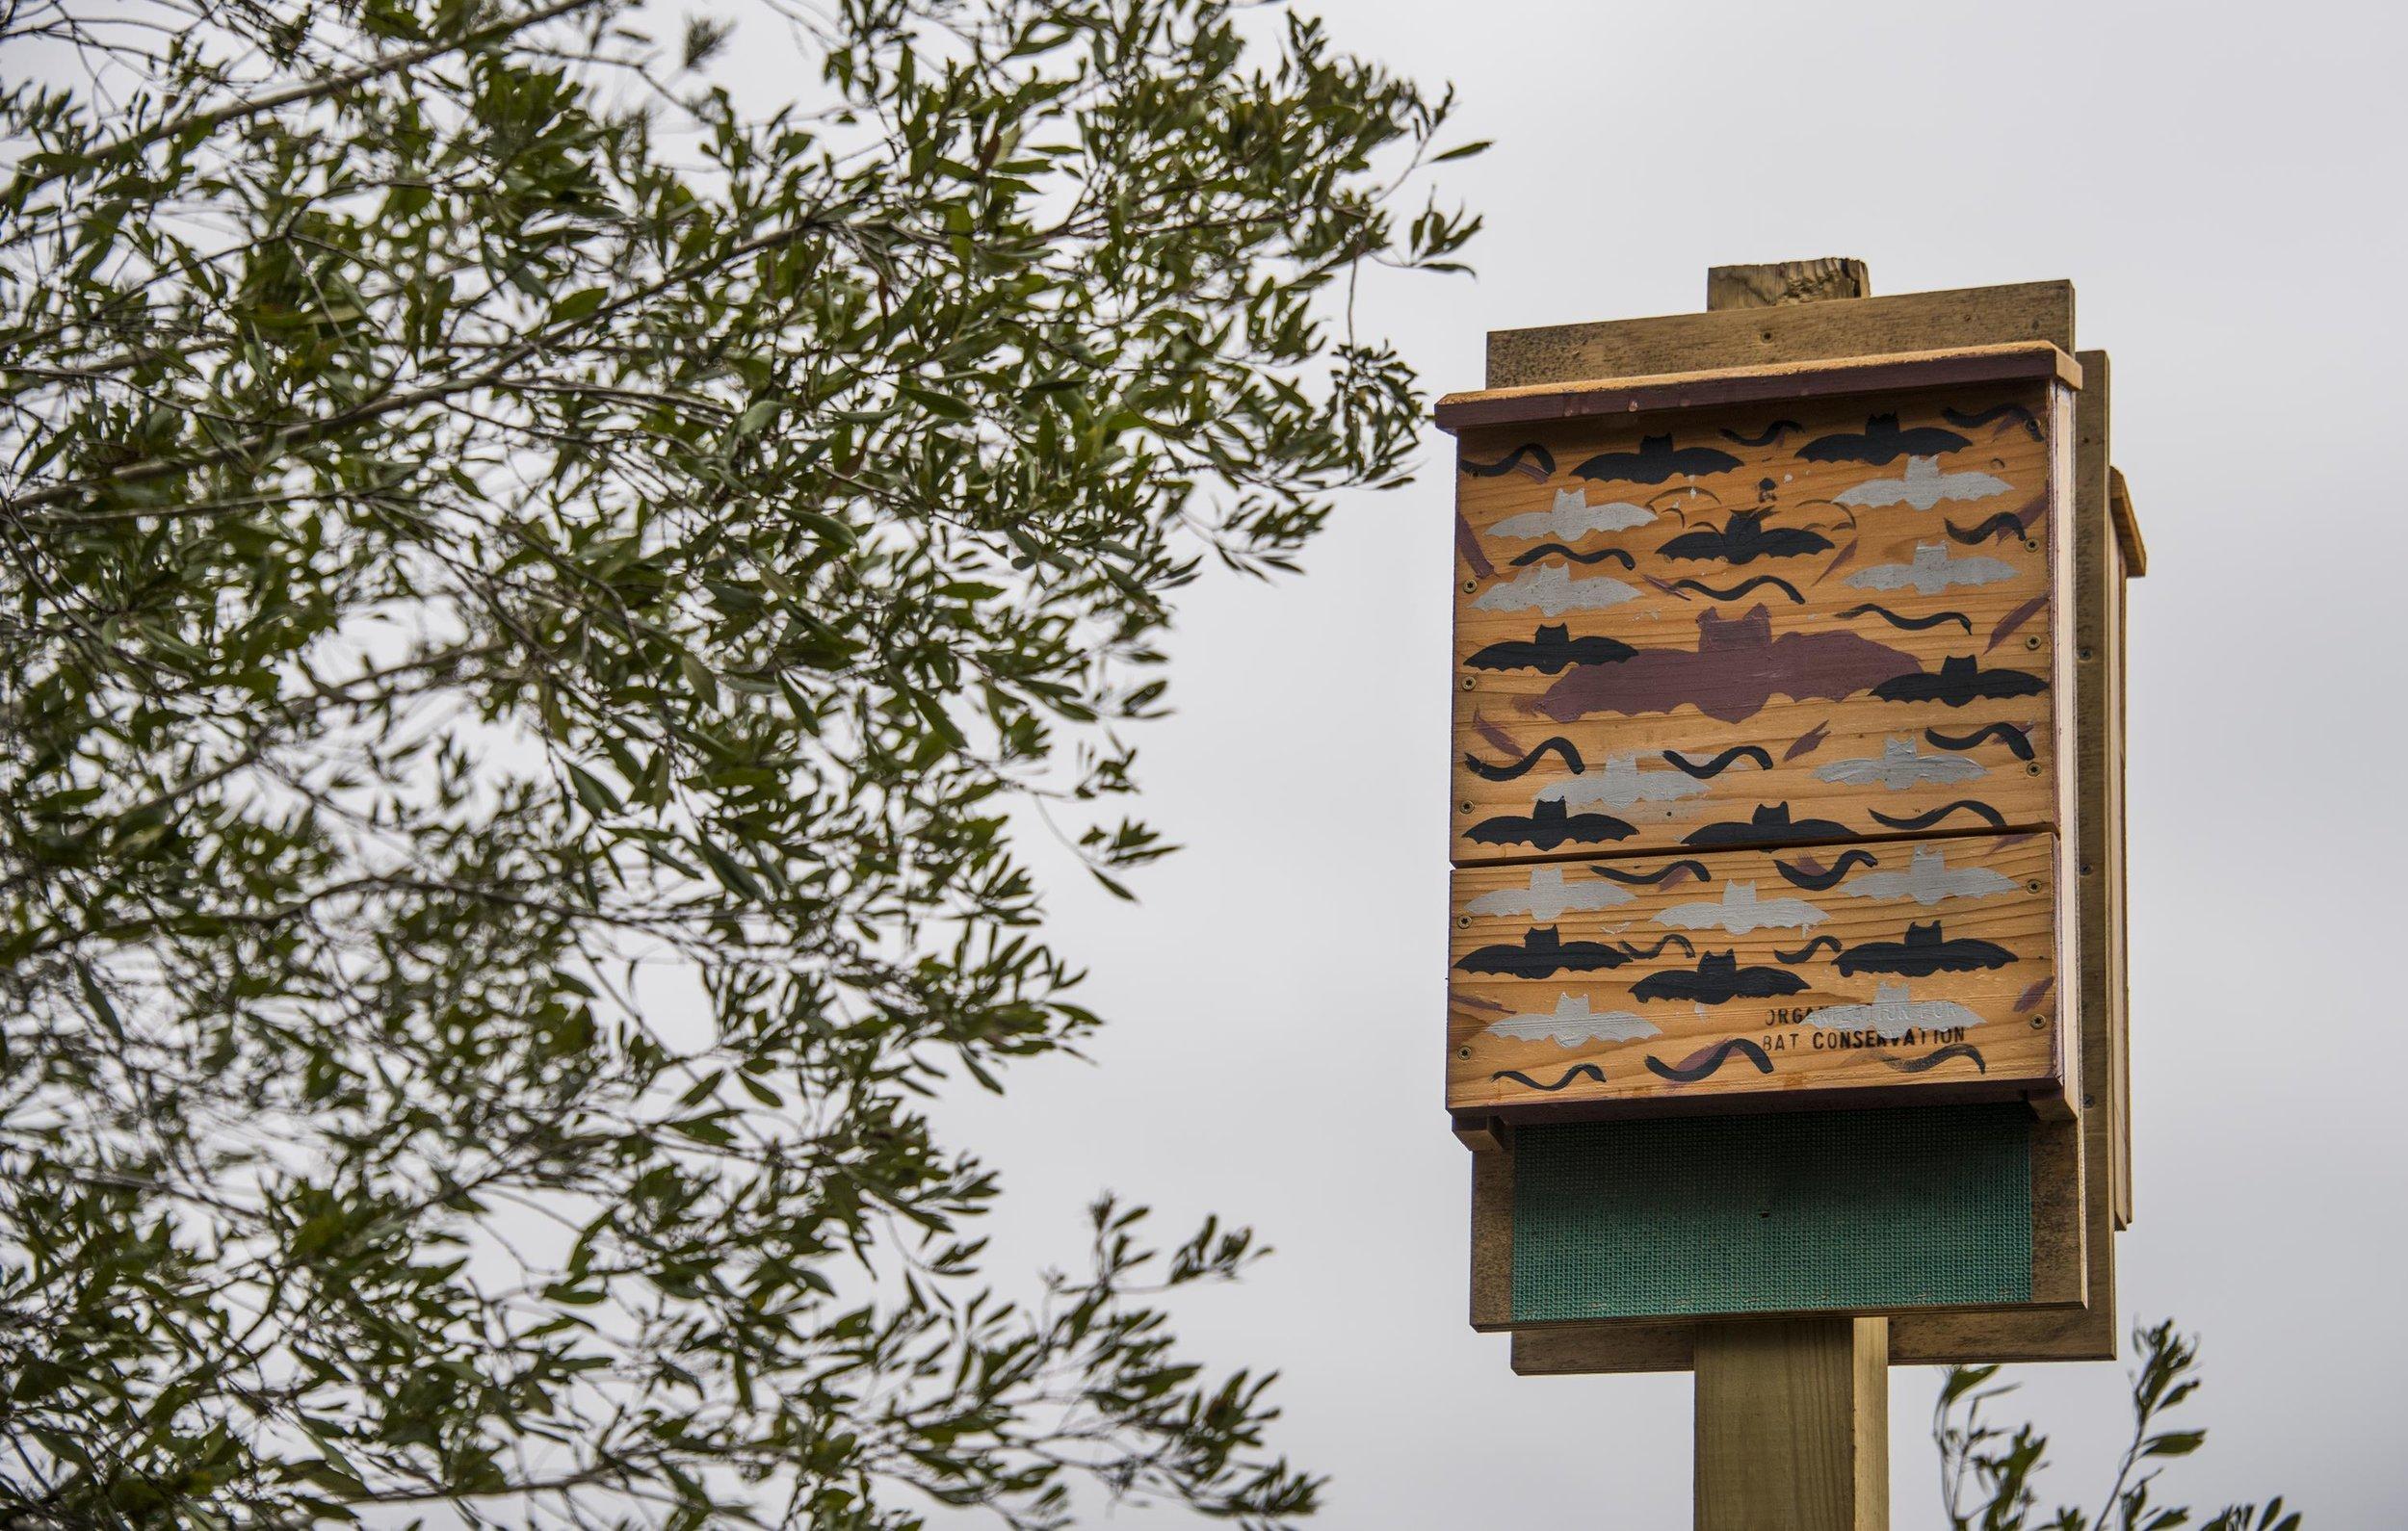 A common design for a    bat house